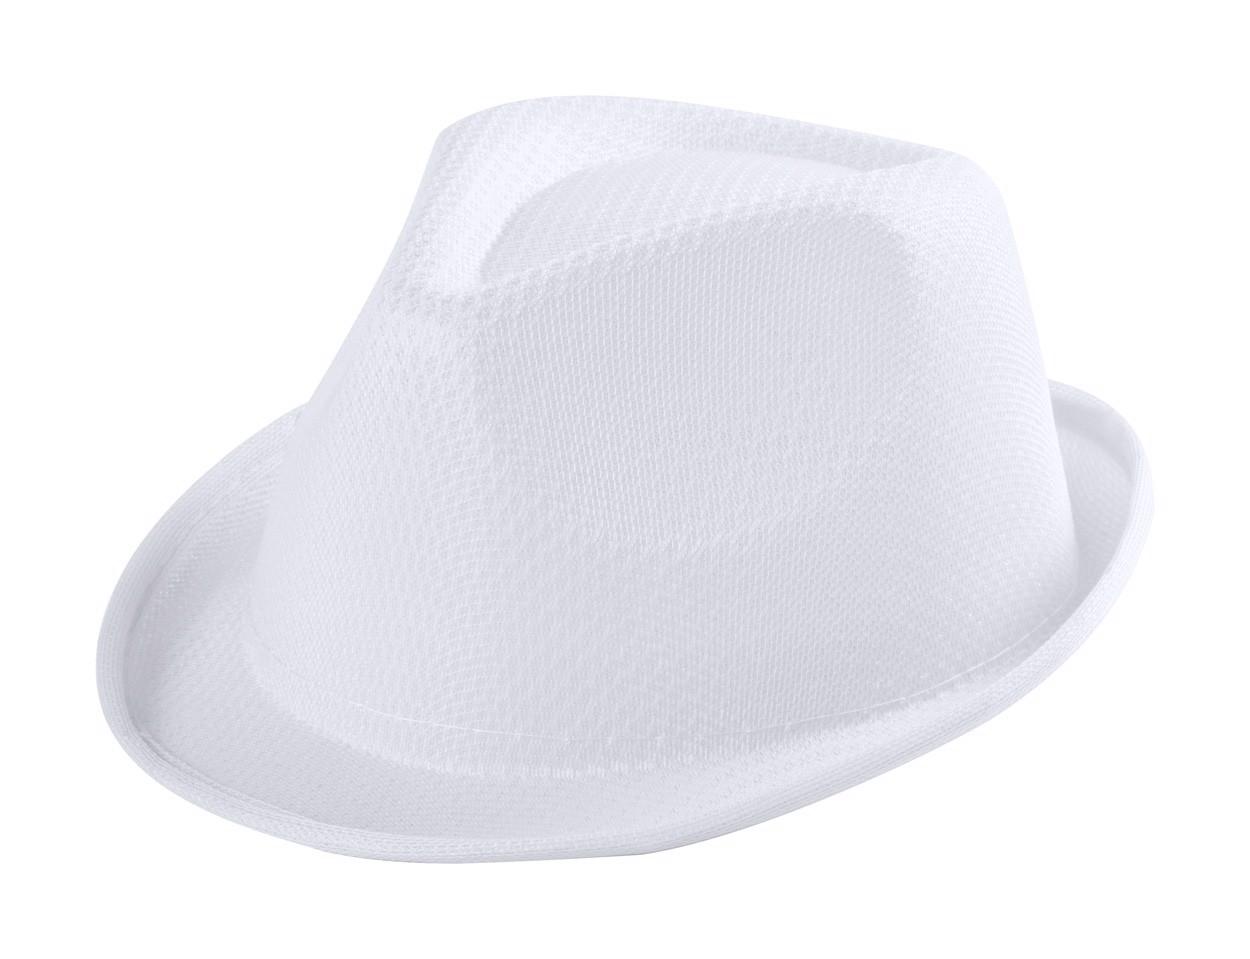 Pălărie Tolvex - Alb